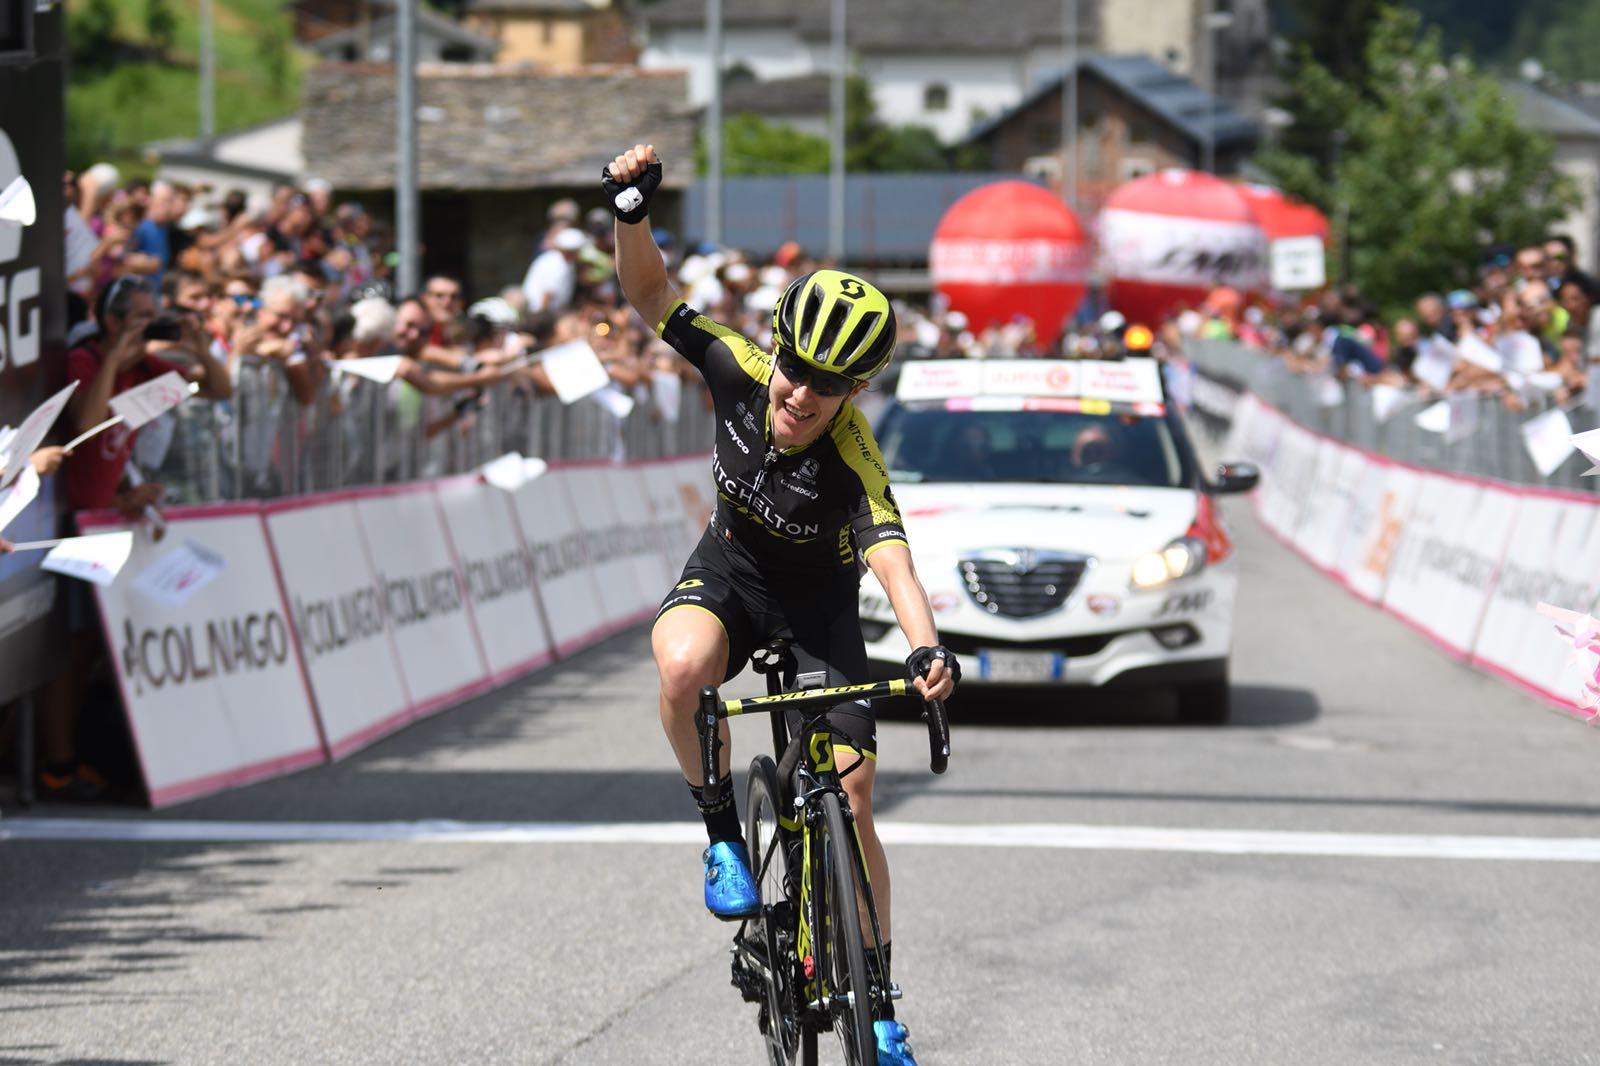 Amanda Spratt vince la sesta tappa del Giro Rosa 2018 a Gerola Alta